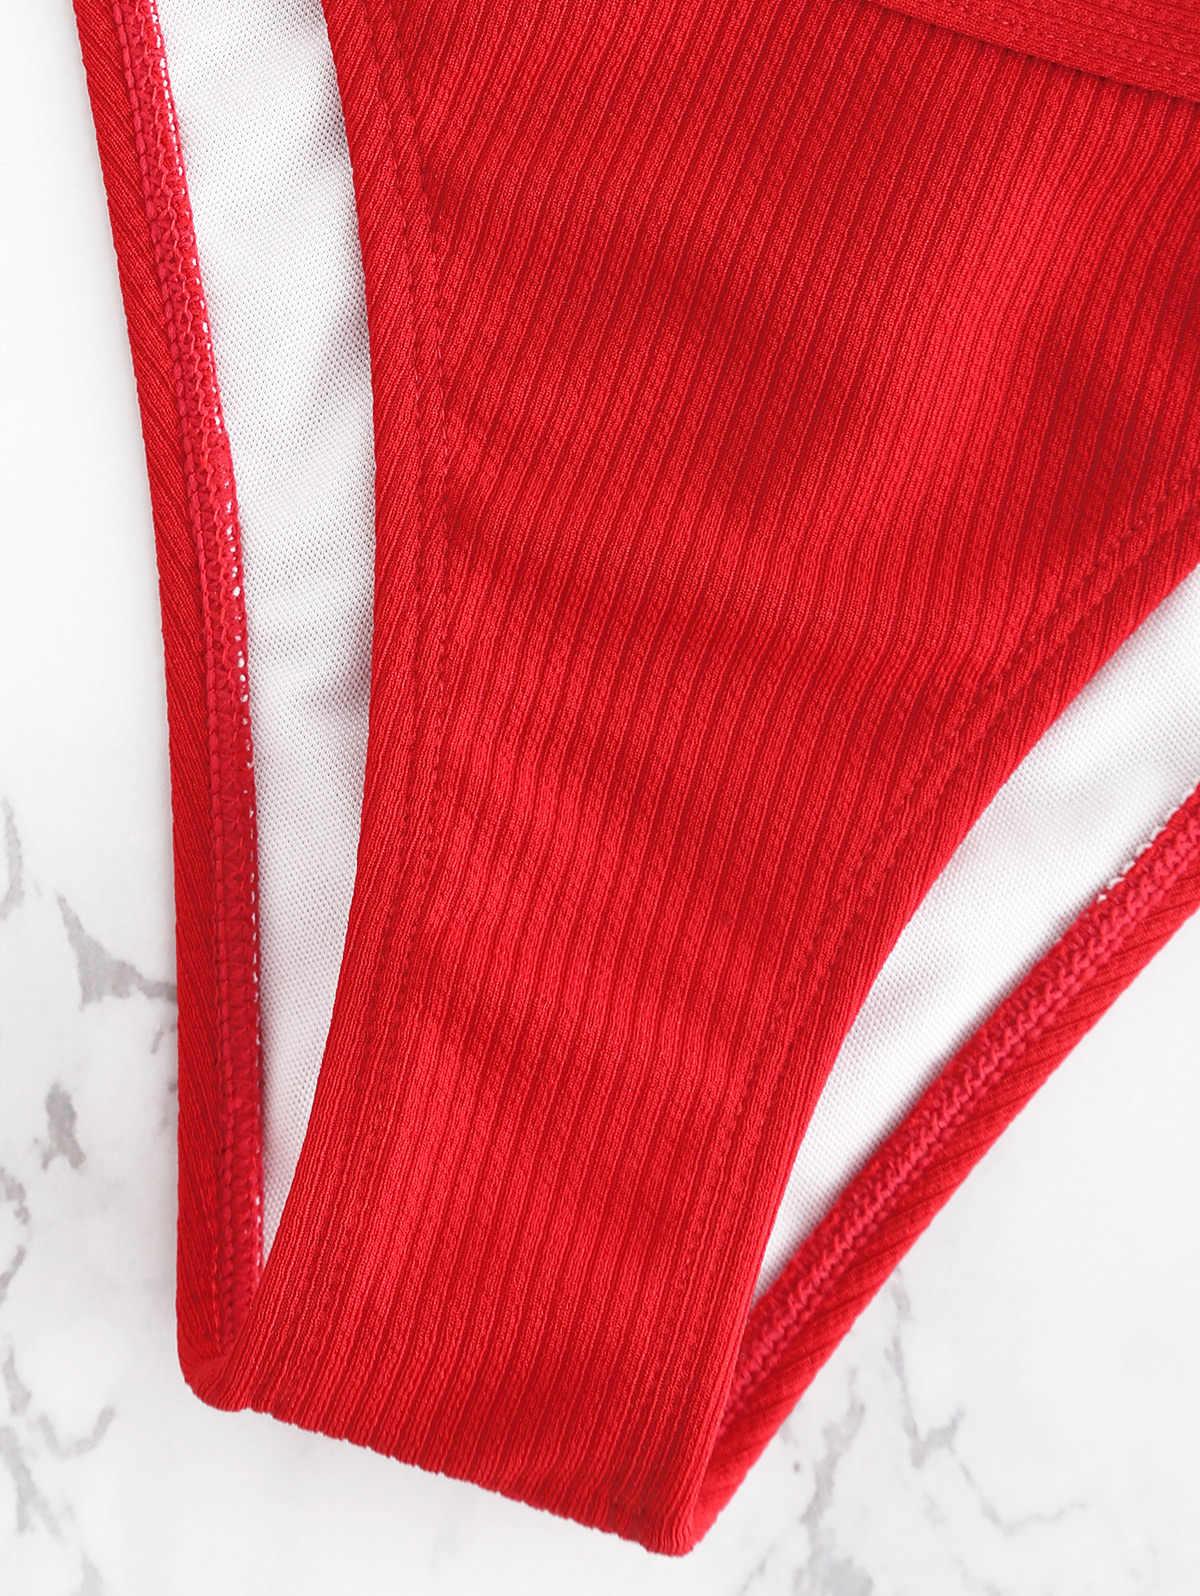 ZAFUL Bikini Hook Ribbed String Bikini Set Kawat Gratis Rendah Pinggang Baju Renang Leher Persegi Baju Renang Empuk Solid Pakaian 2019